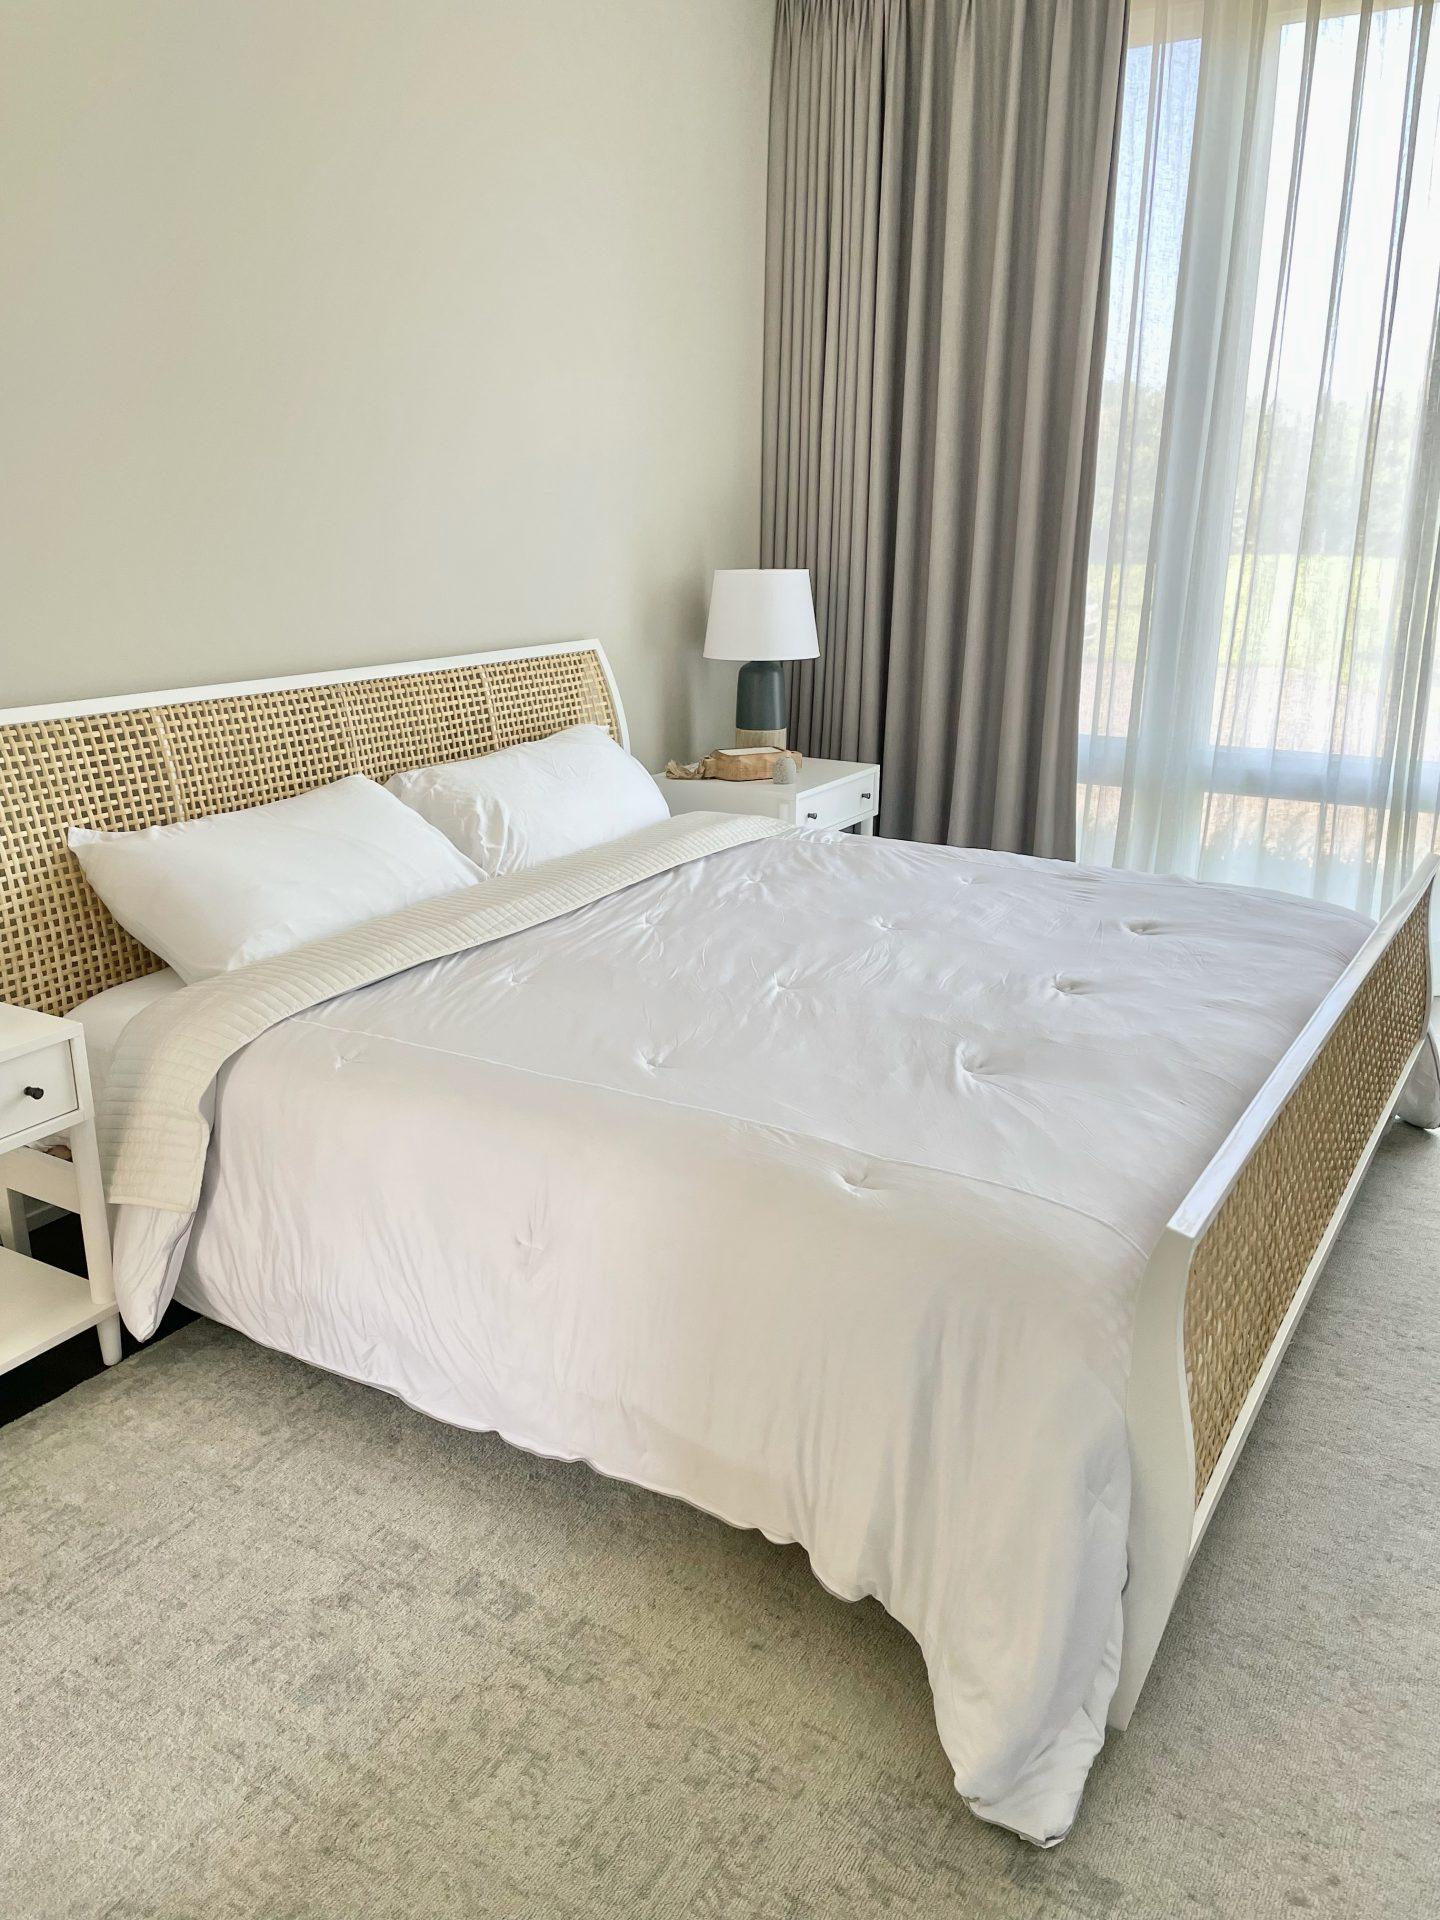 sheex cooling sheets